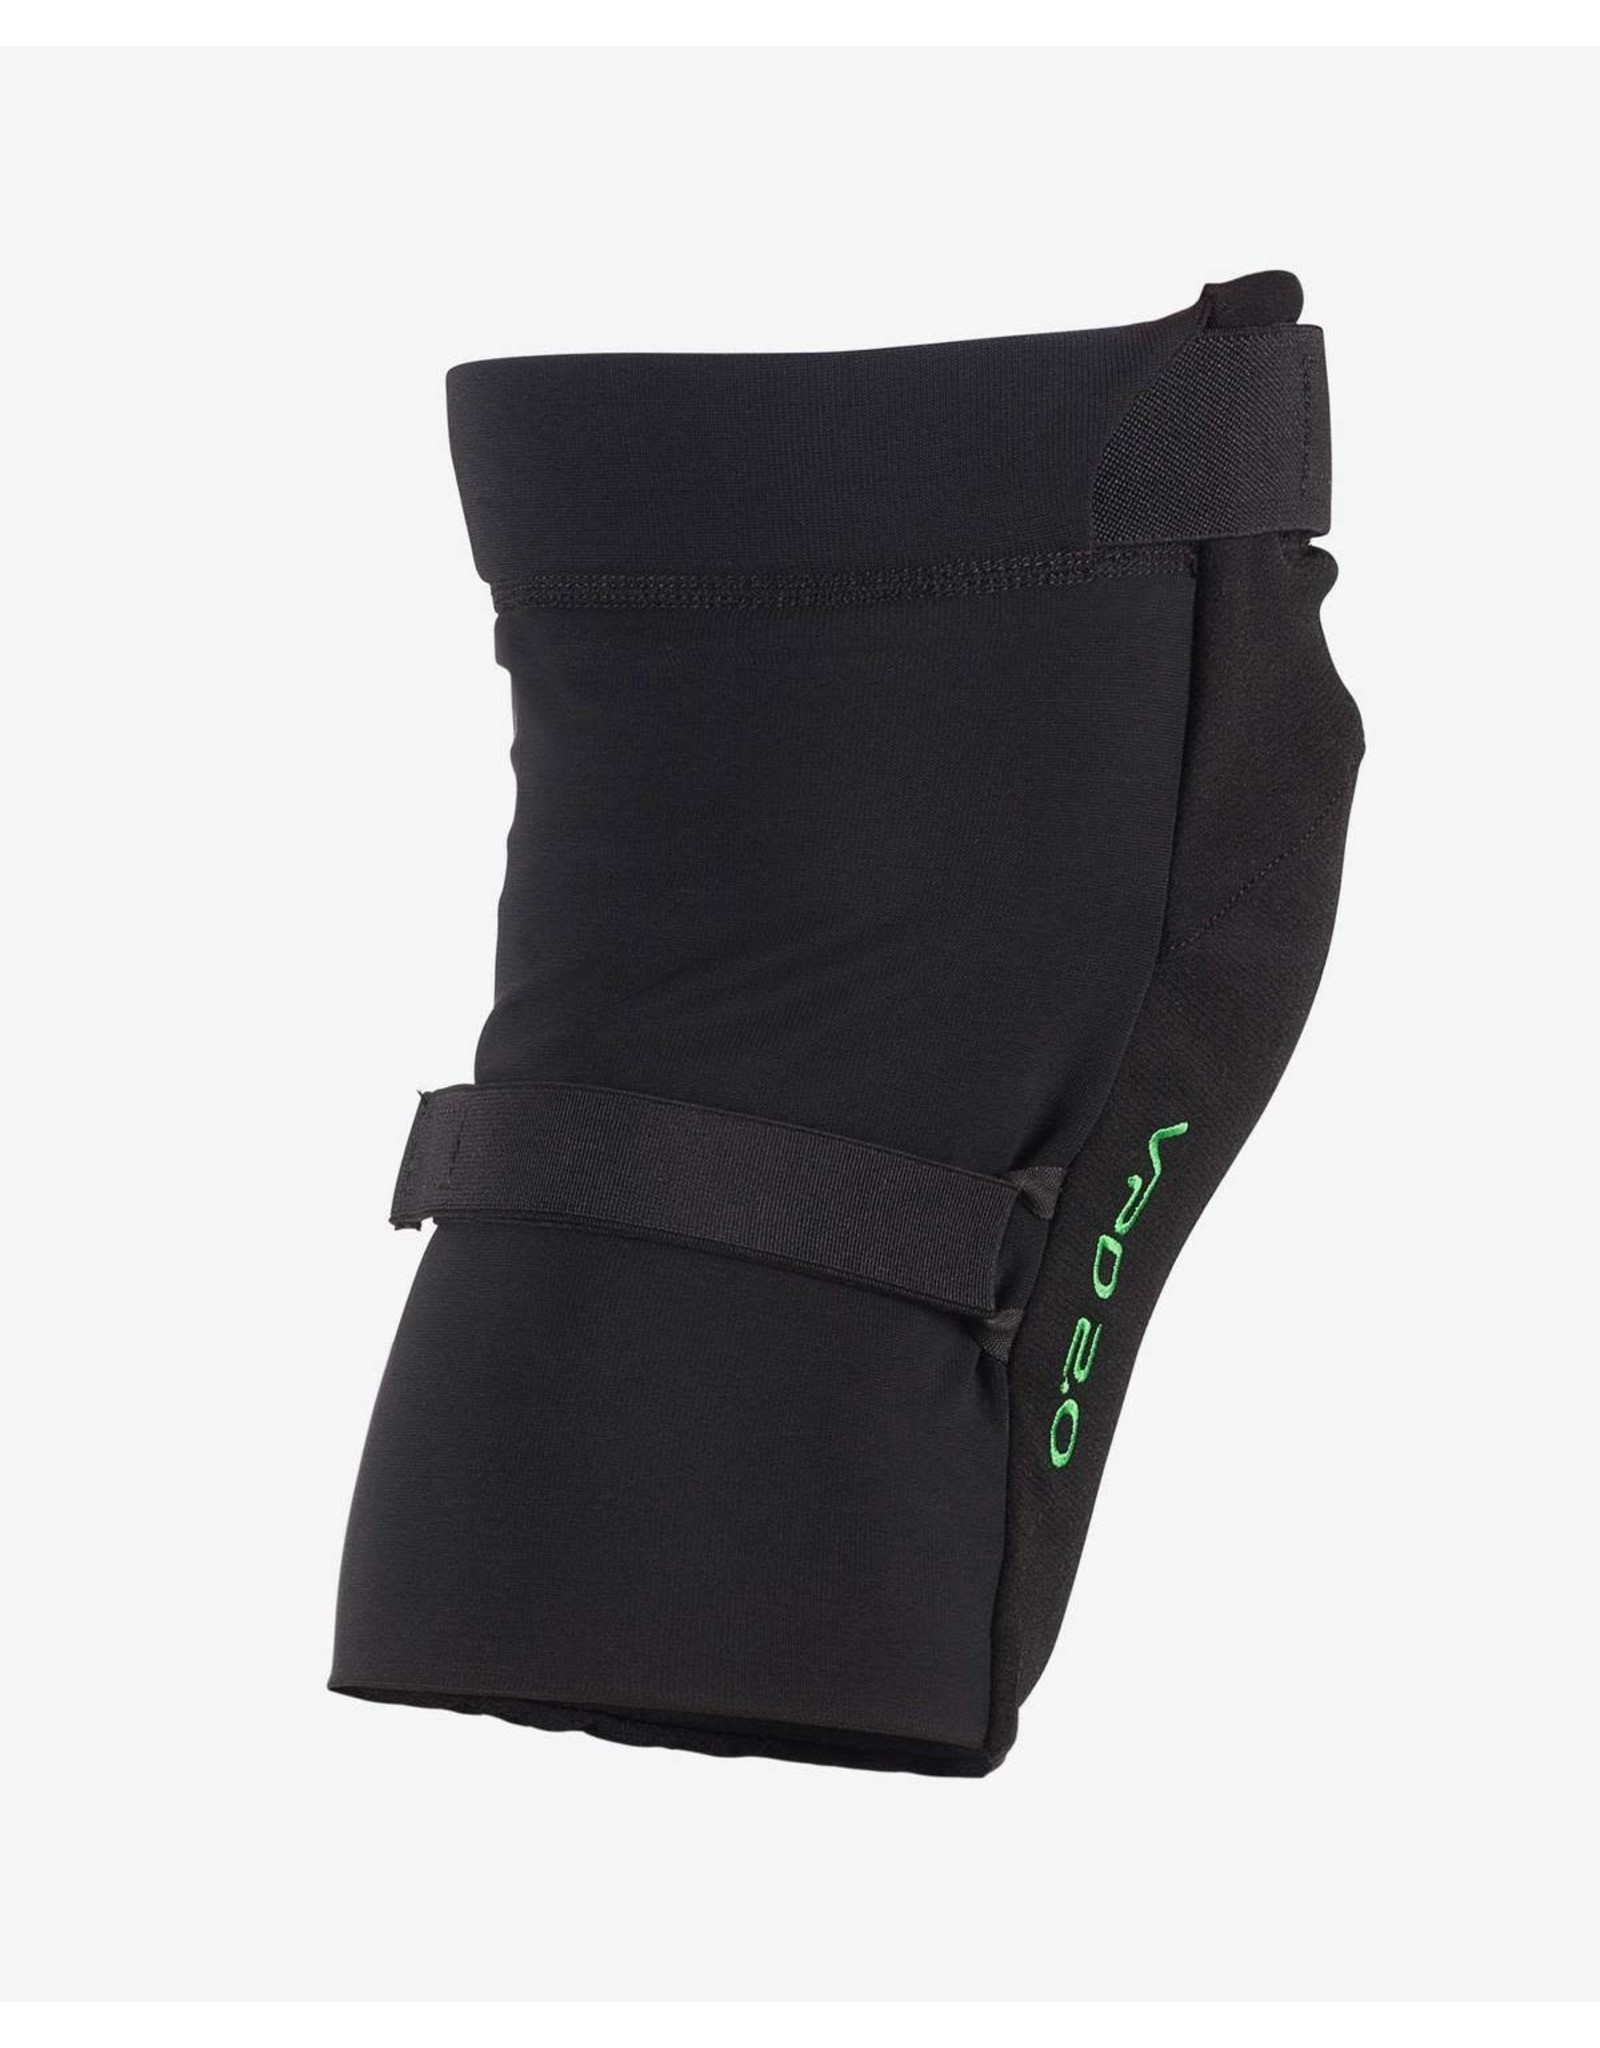 POC Protège-genoux POC Joint VPD 2.0